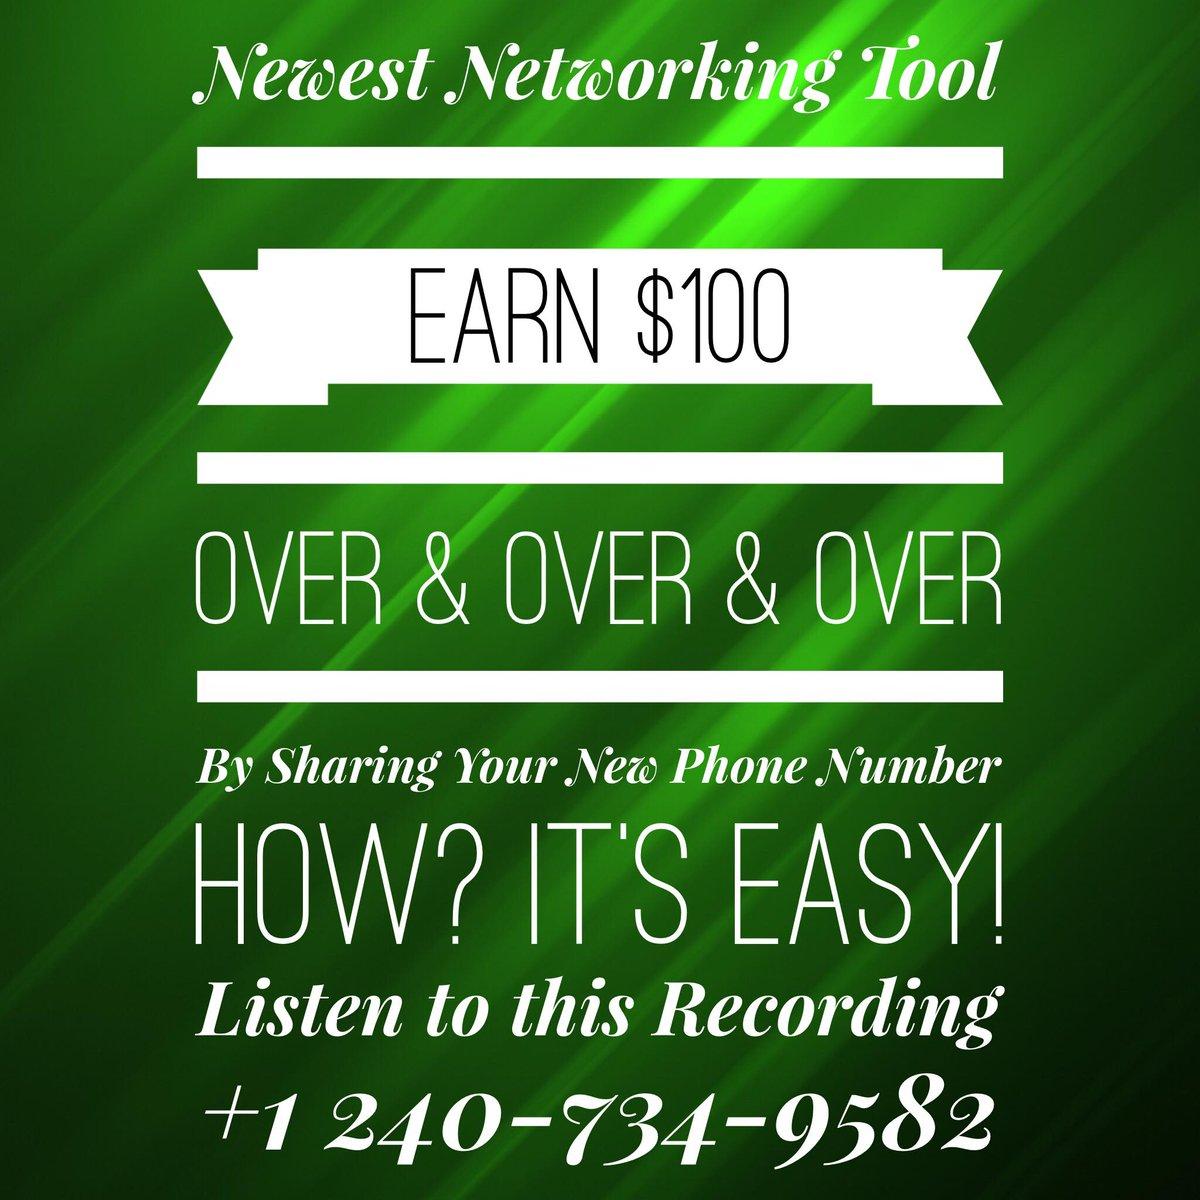 #earnmoney #newphonesystem #hotmarketingtool #workfromphone #reidualincomepic.twitter.com/ZTreMDsANA